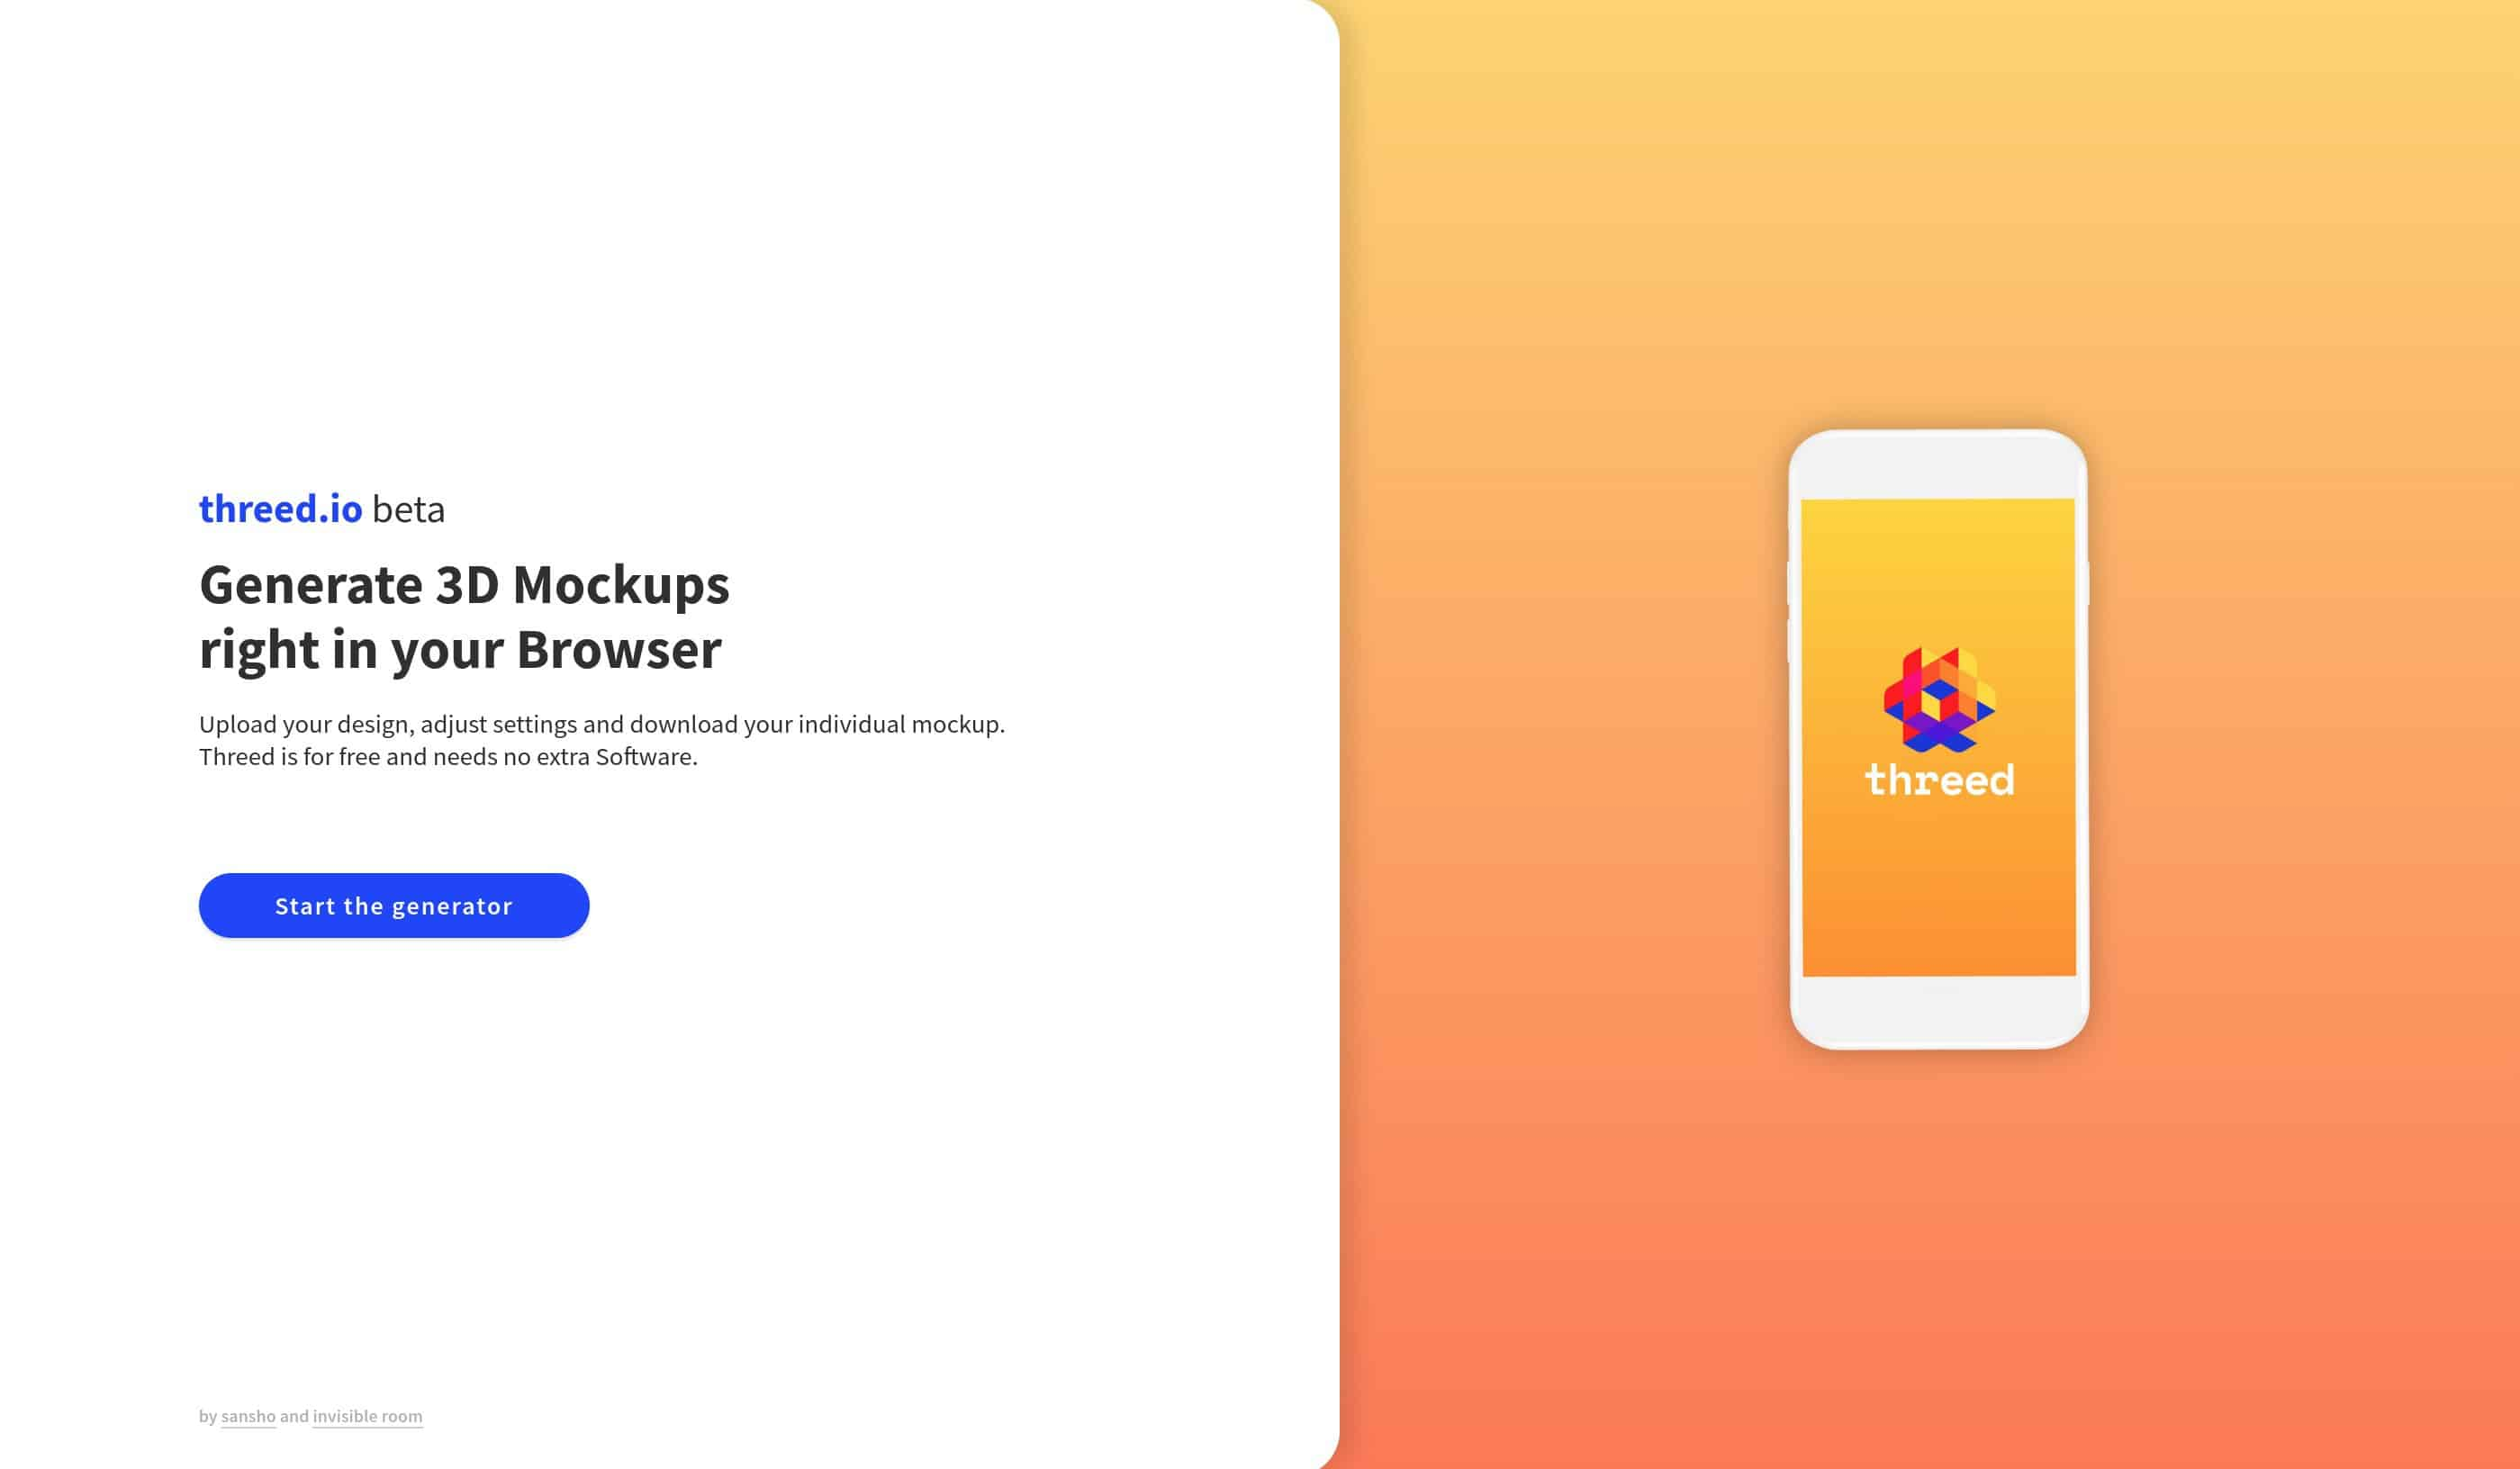 Screenshot of the homepage of threed.io, a free tool for smartphone display mockups